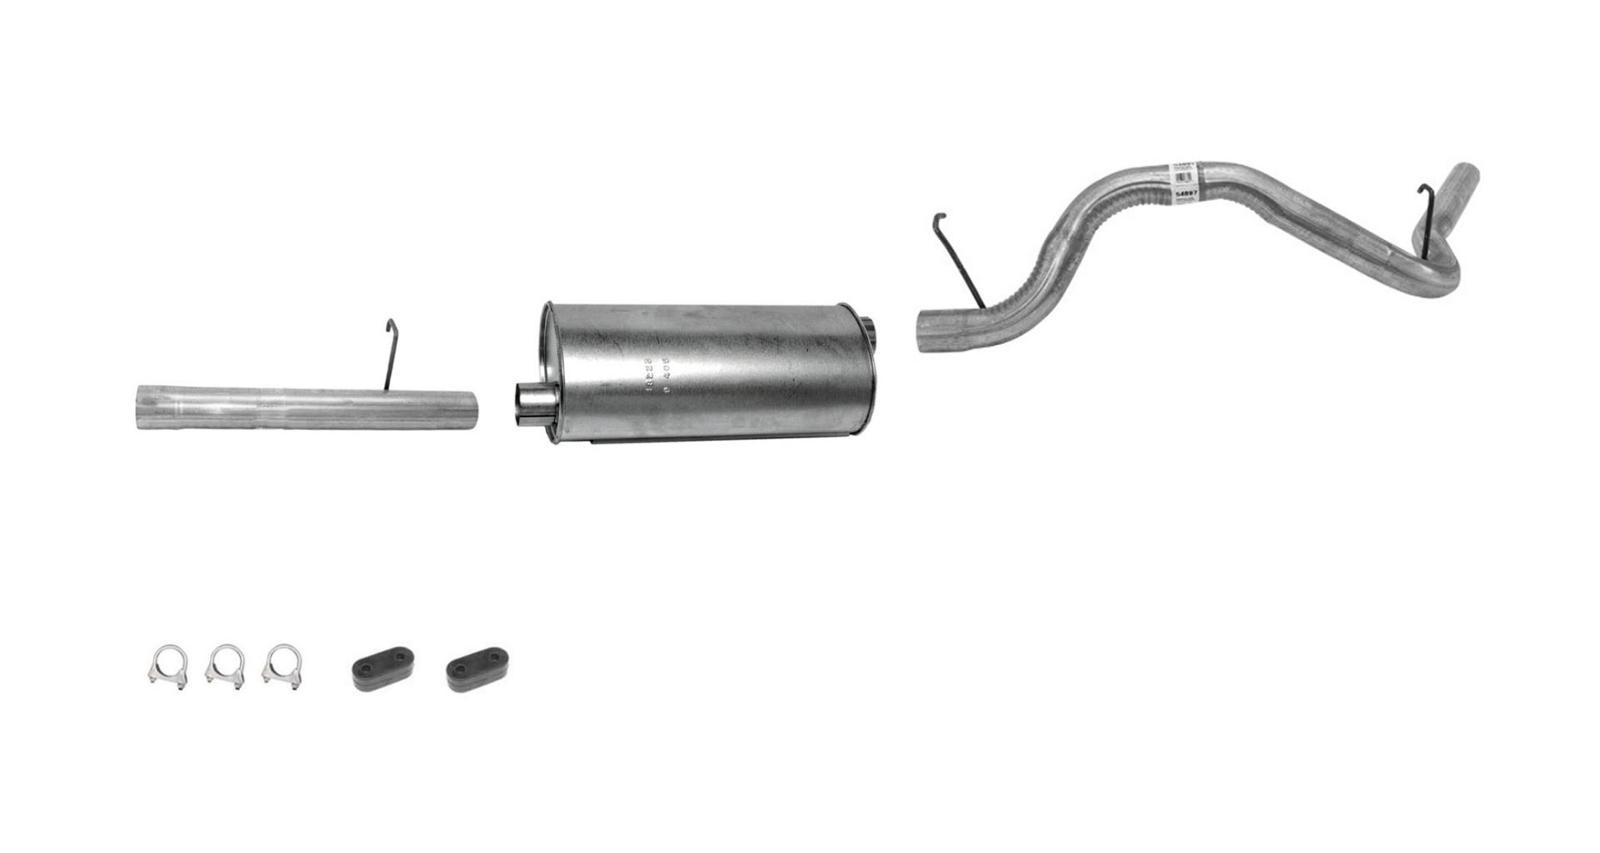 94 95 Gm Astro Van 4 3l Muffler Exhaust Pipe System 2b